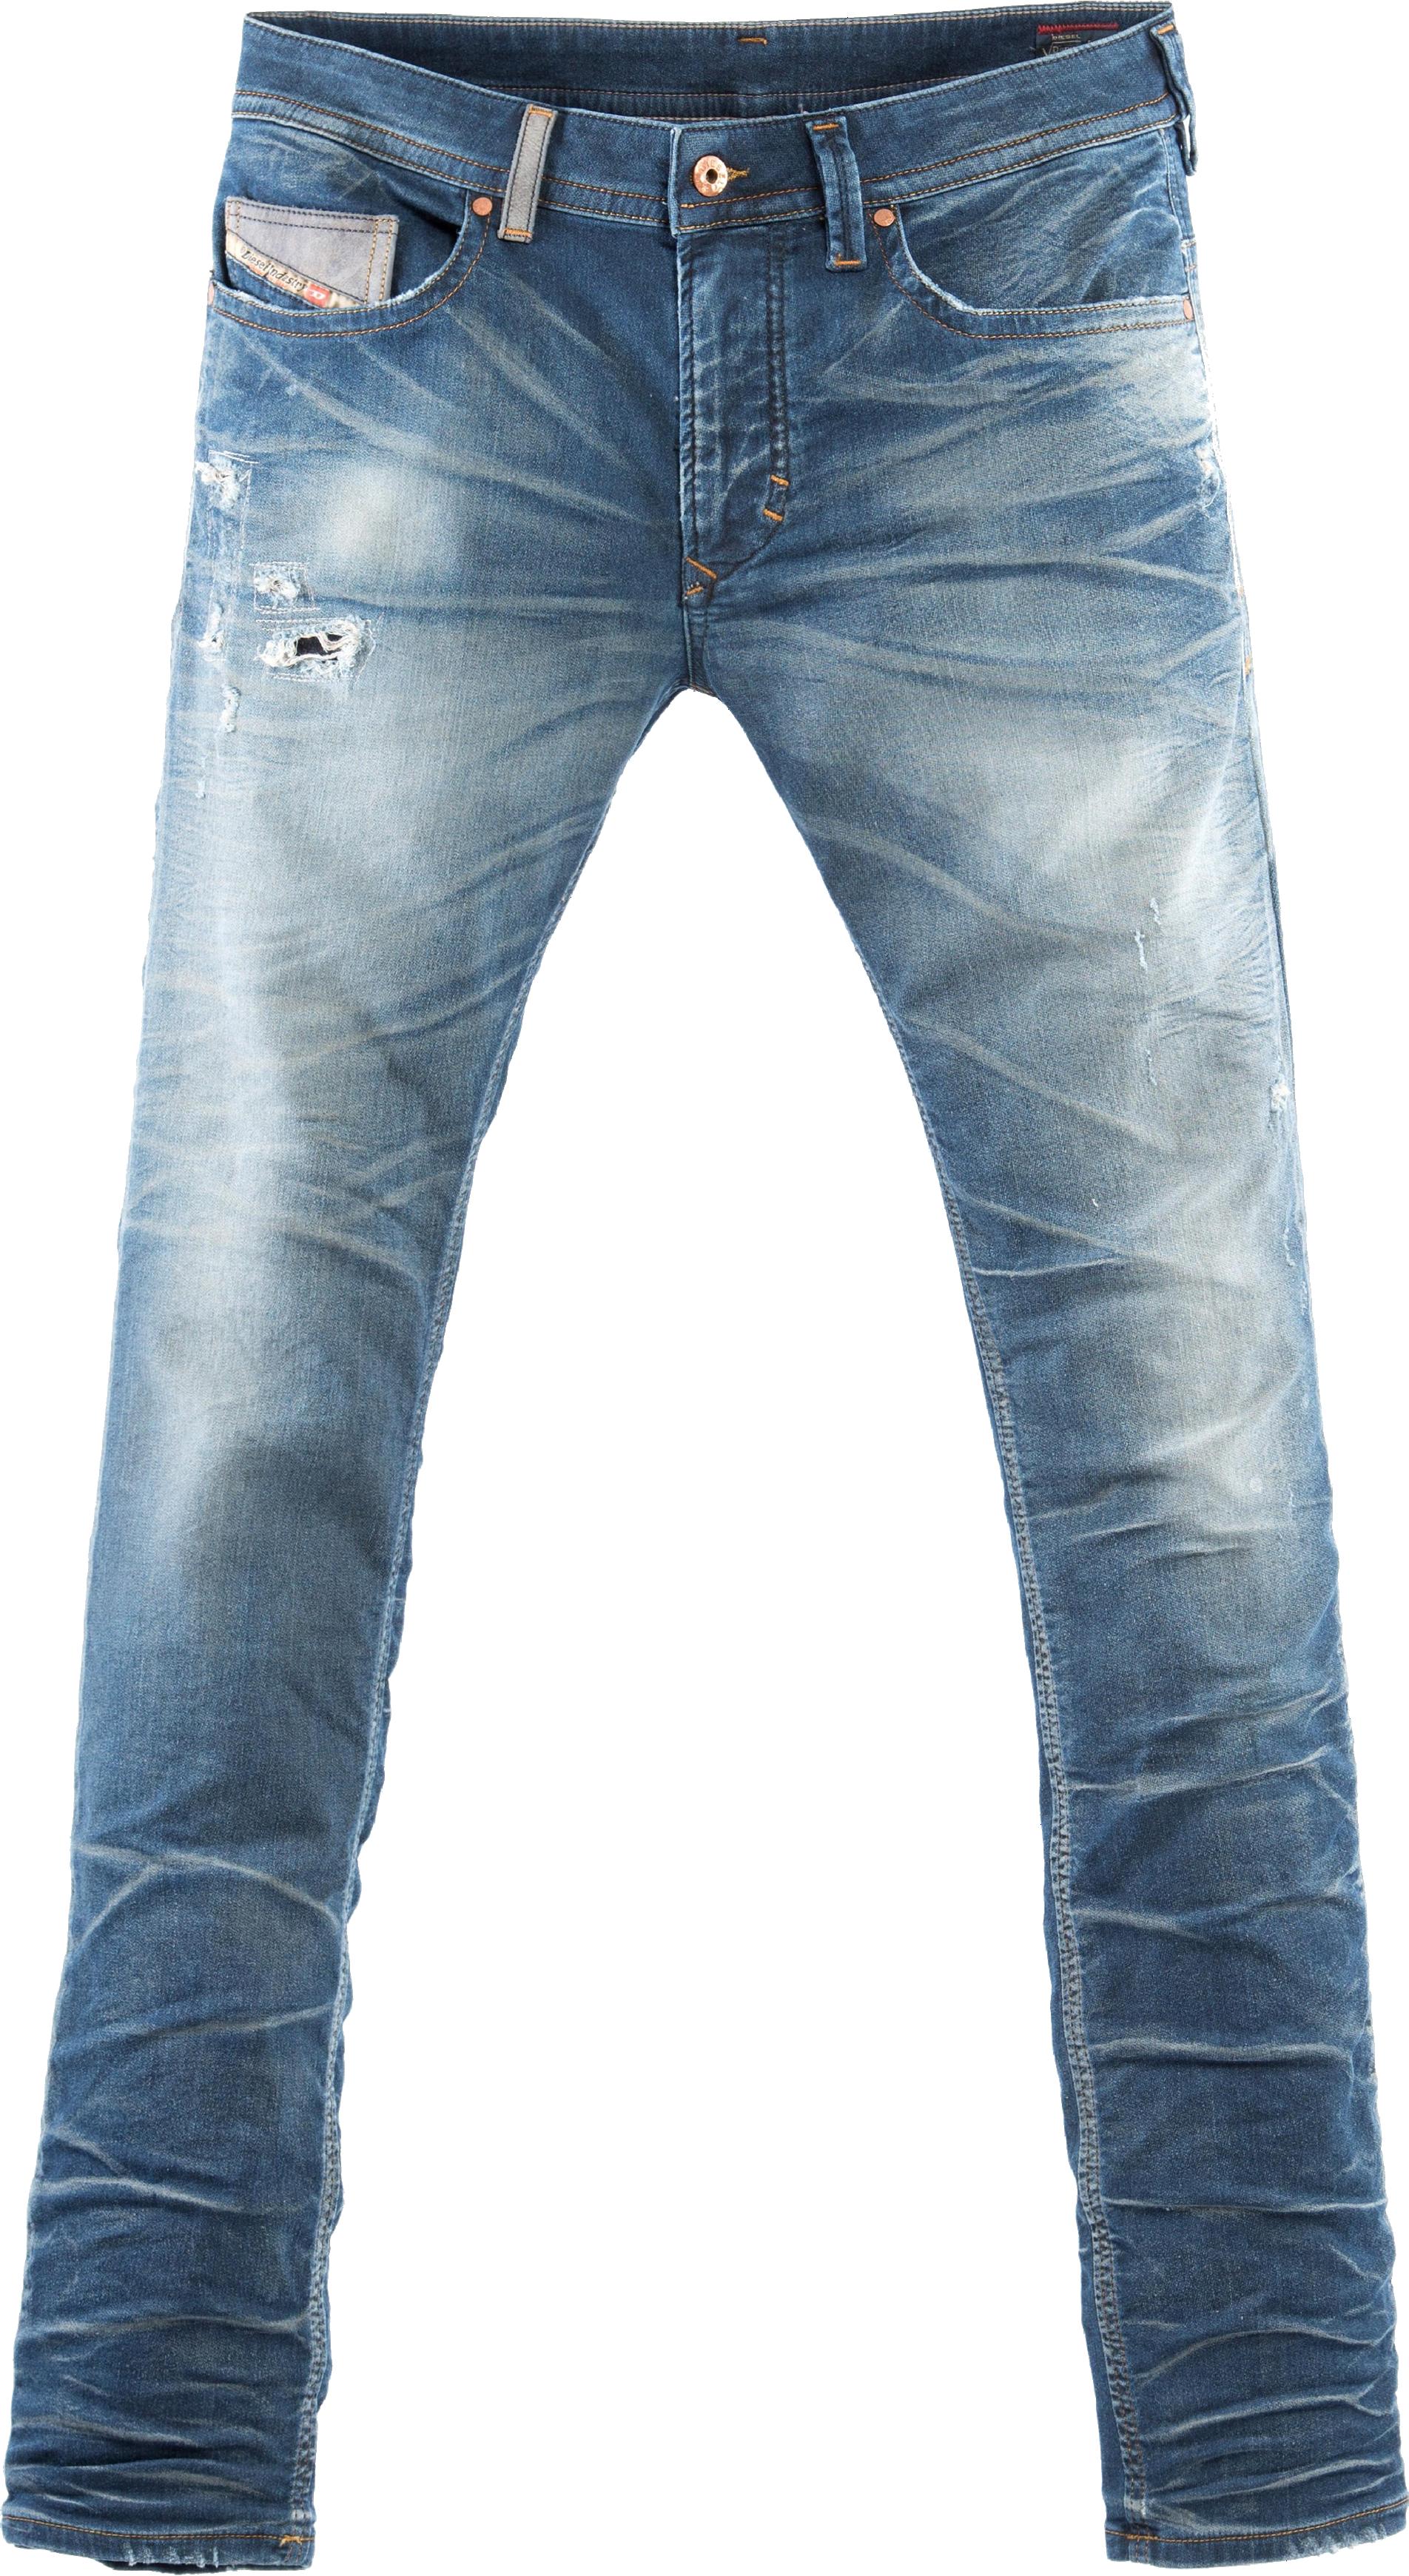 Free Mens Pants Cliparts Download Free Clip Art Free